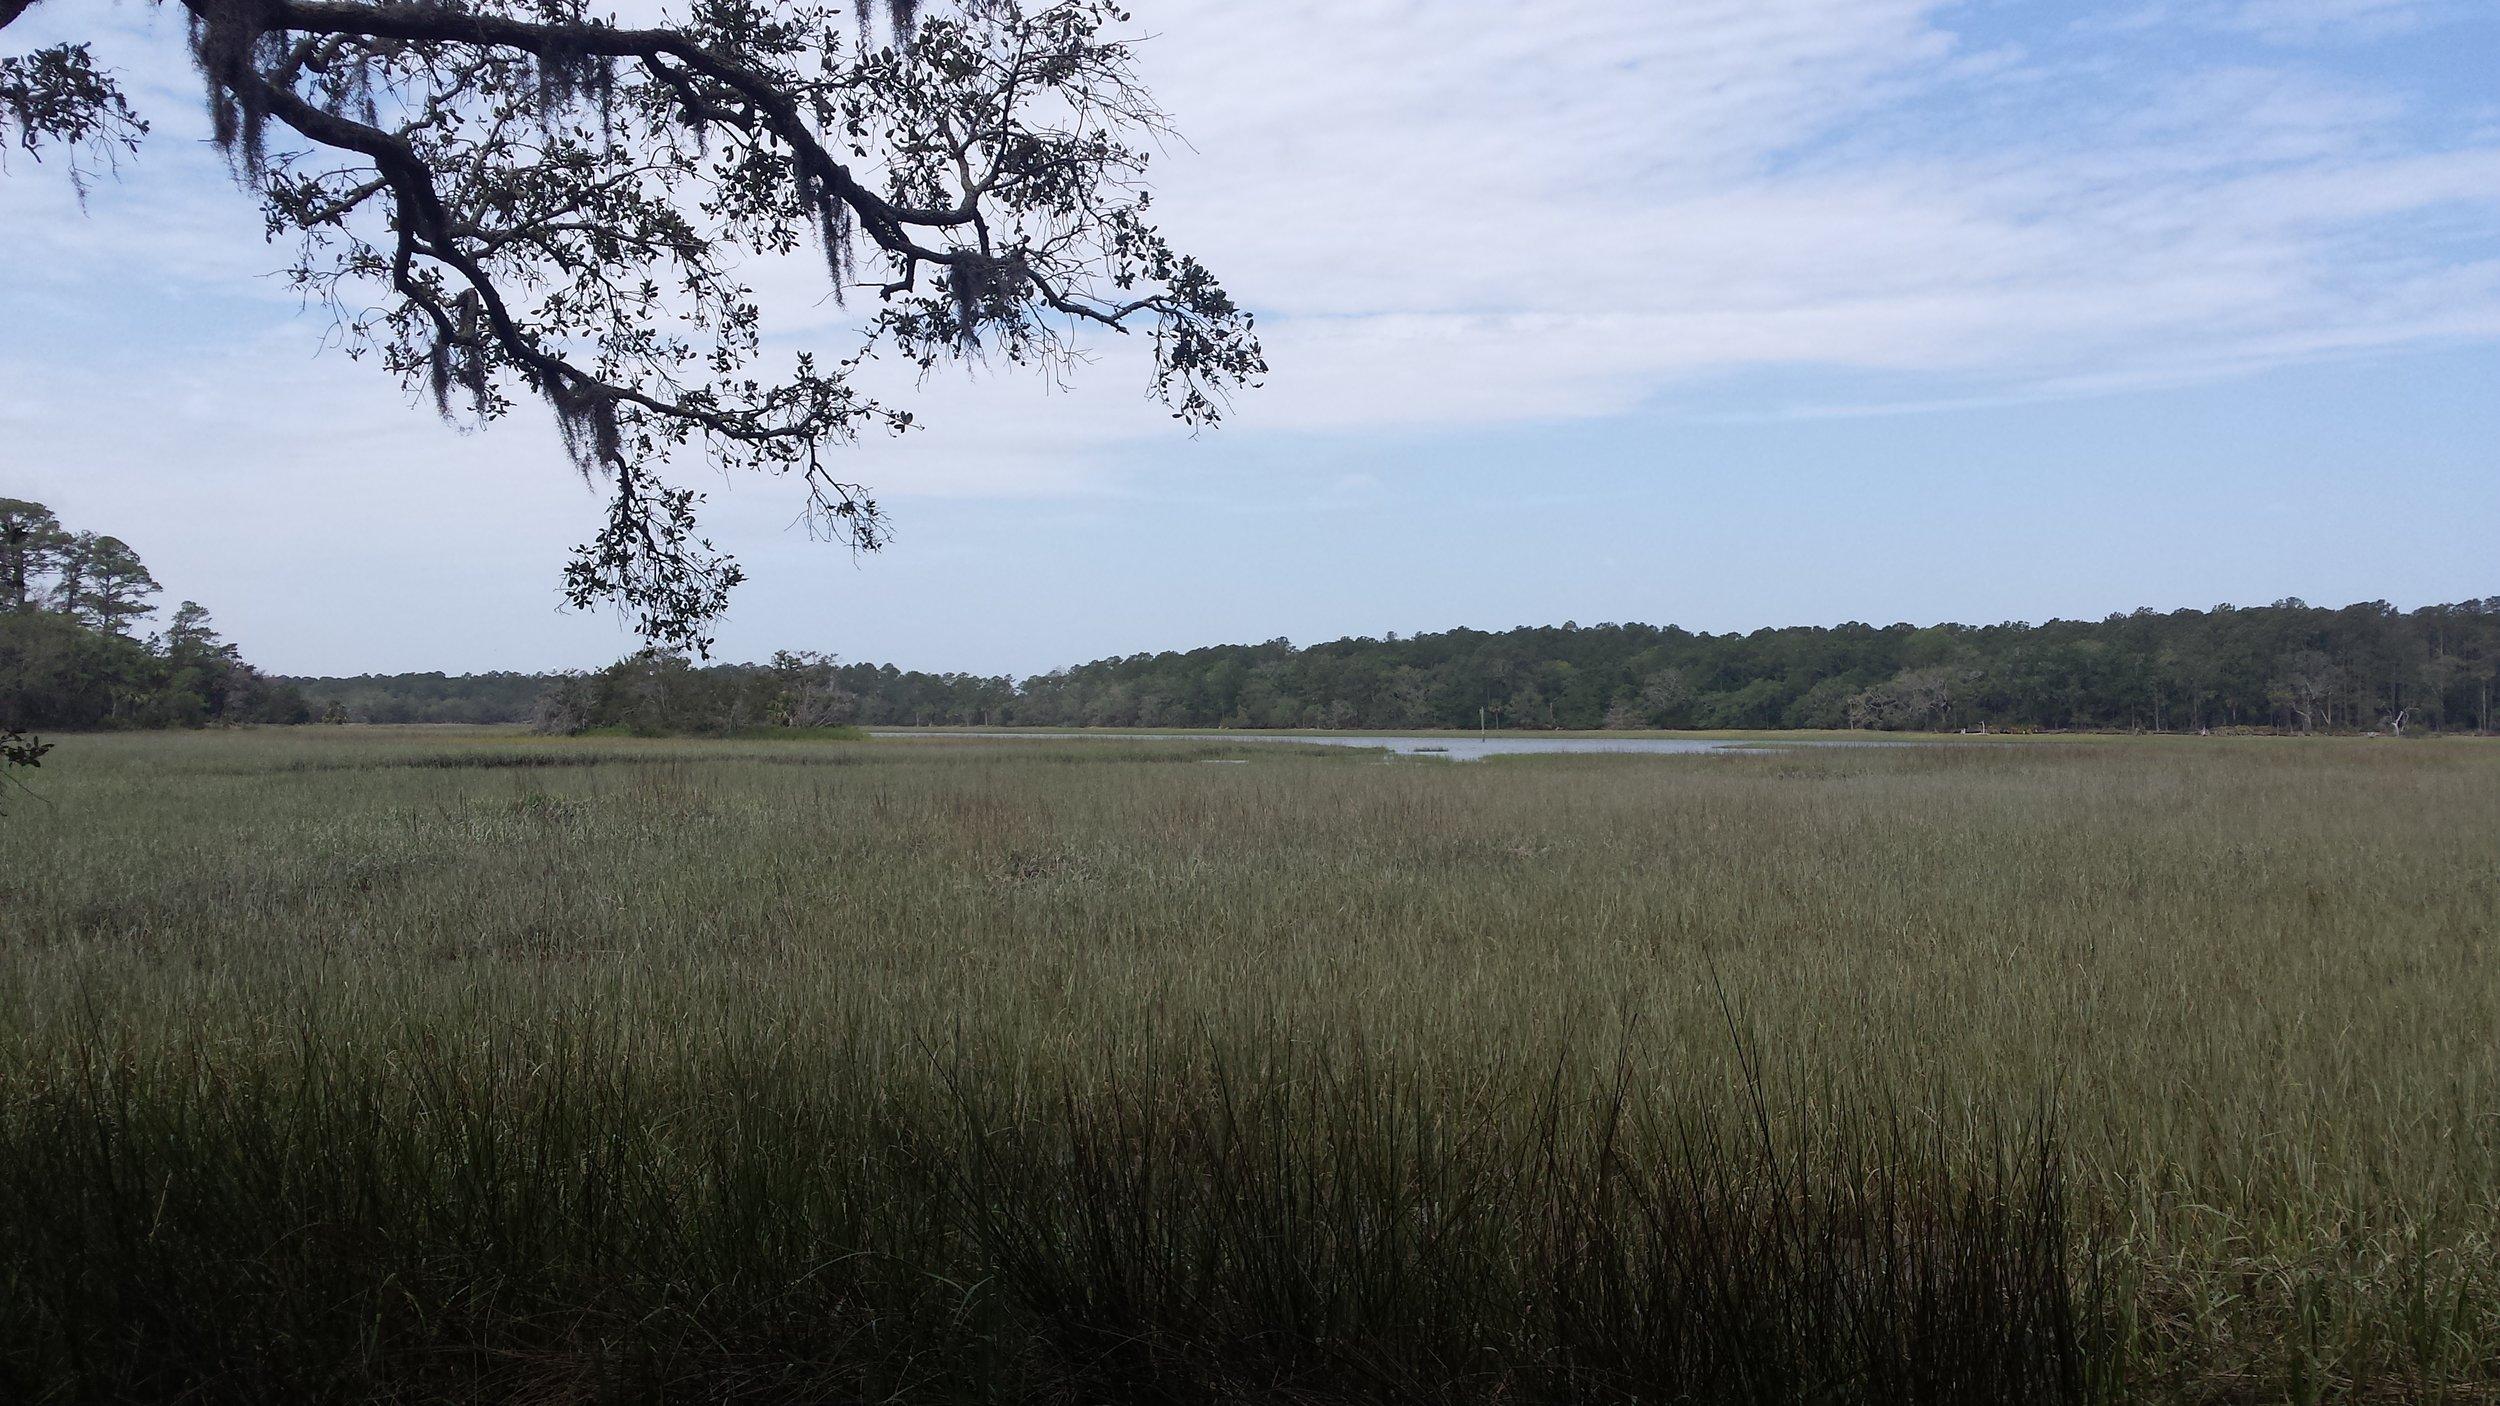 View of the salt marsh on Skidaway Island